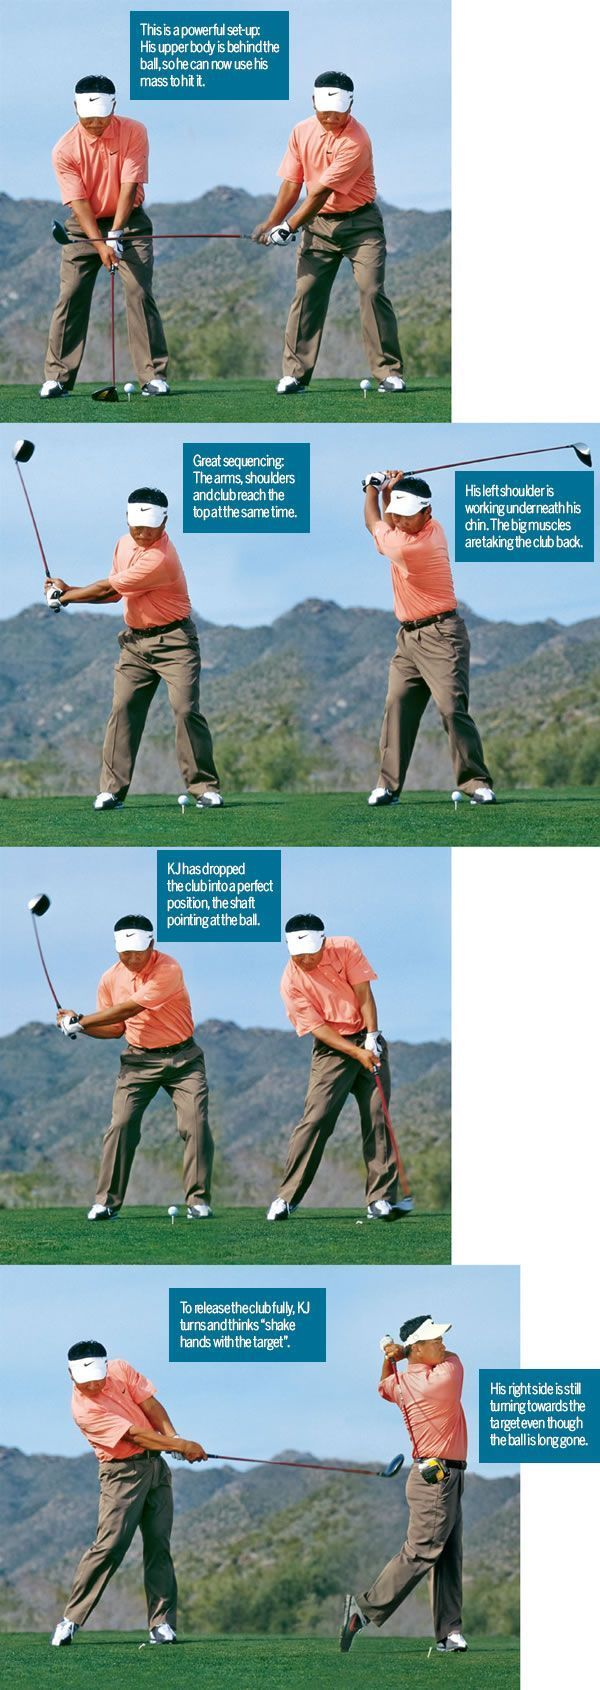 Golf Tips Stack And Tilt Wwwcrippencarscom Crippencarsgolftips